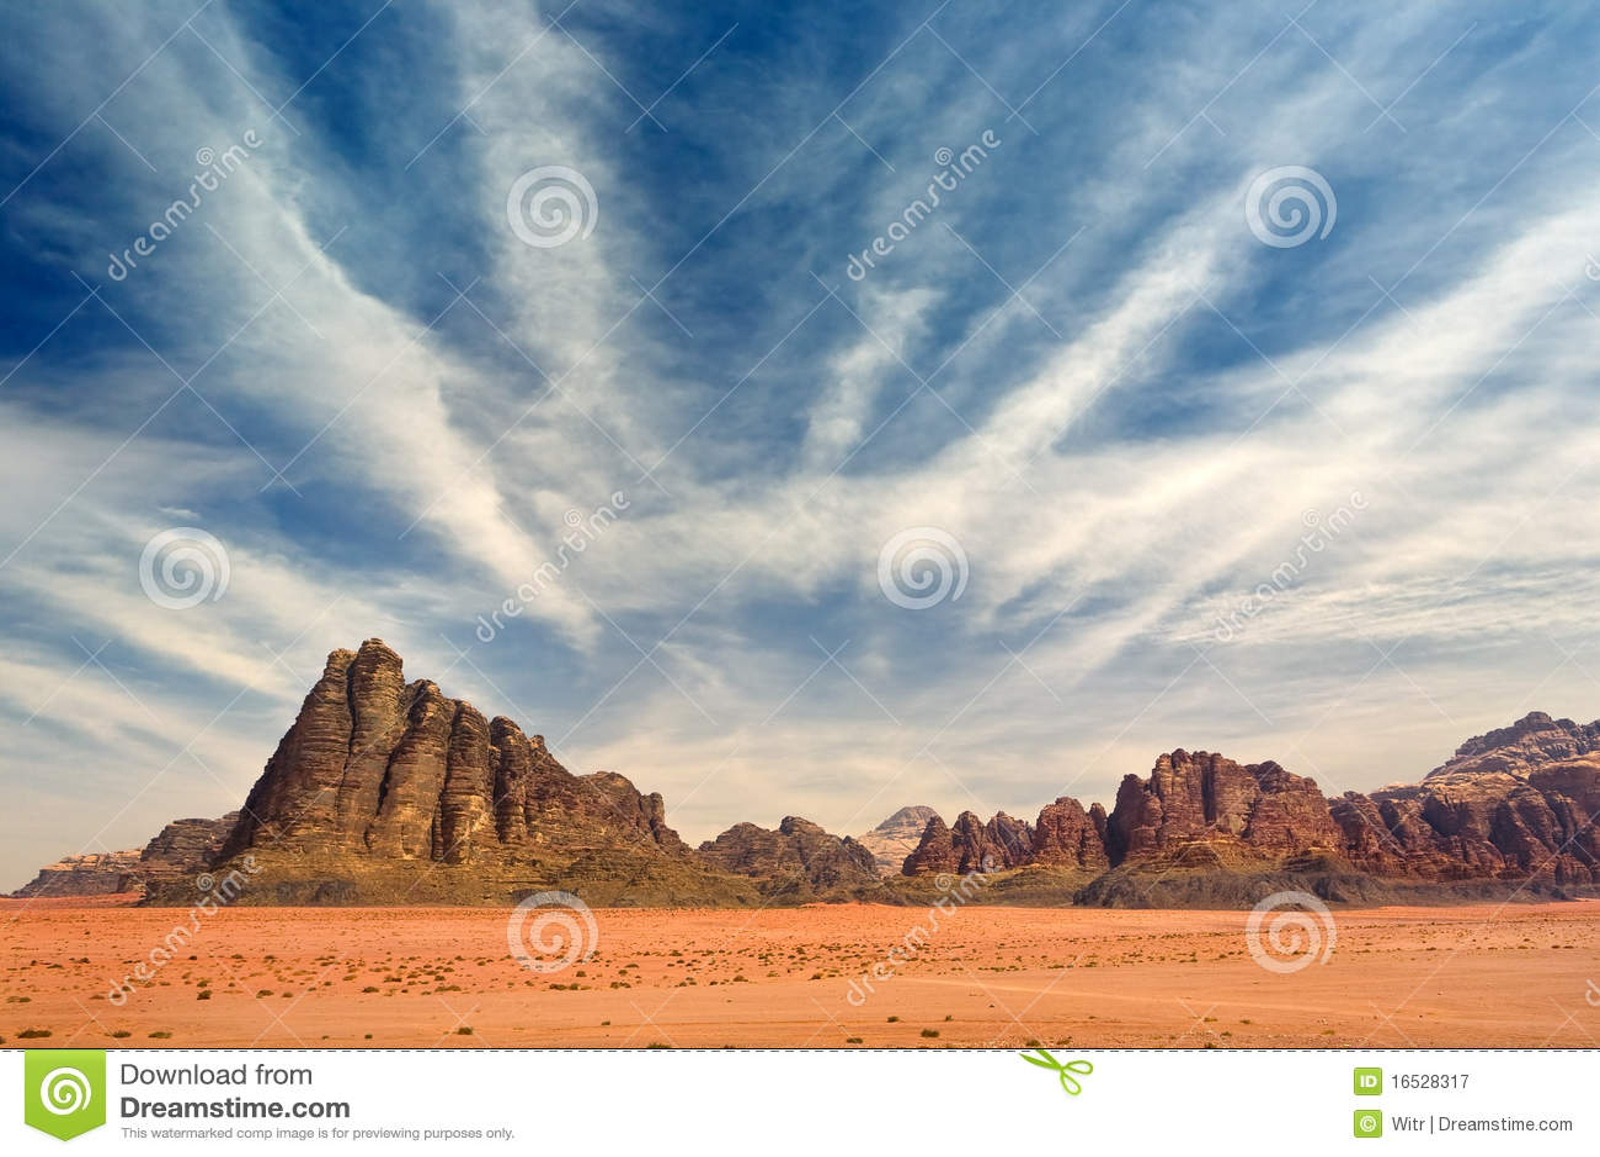 вади рома пустыни